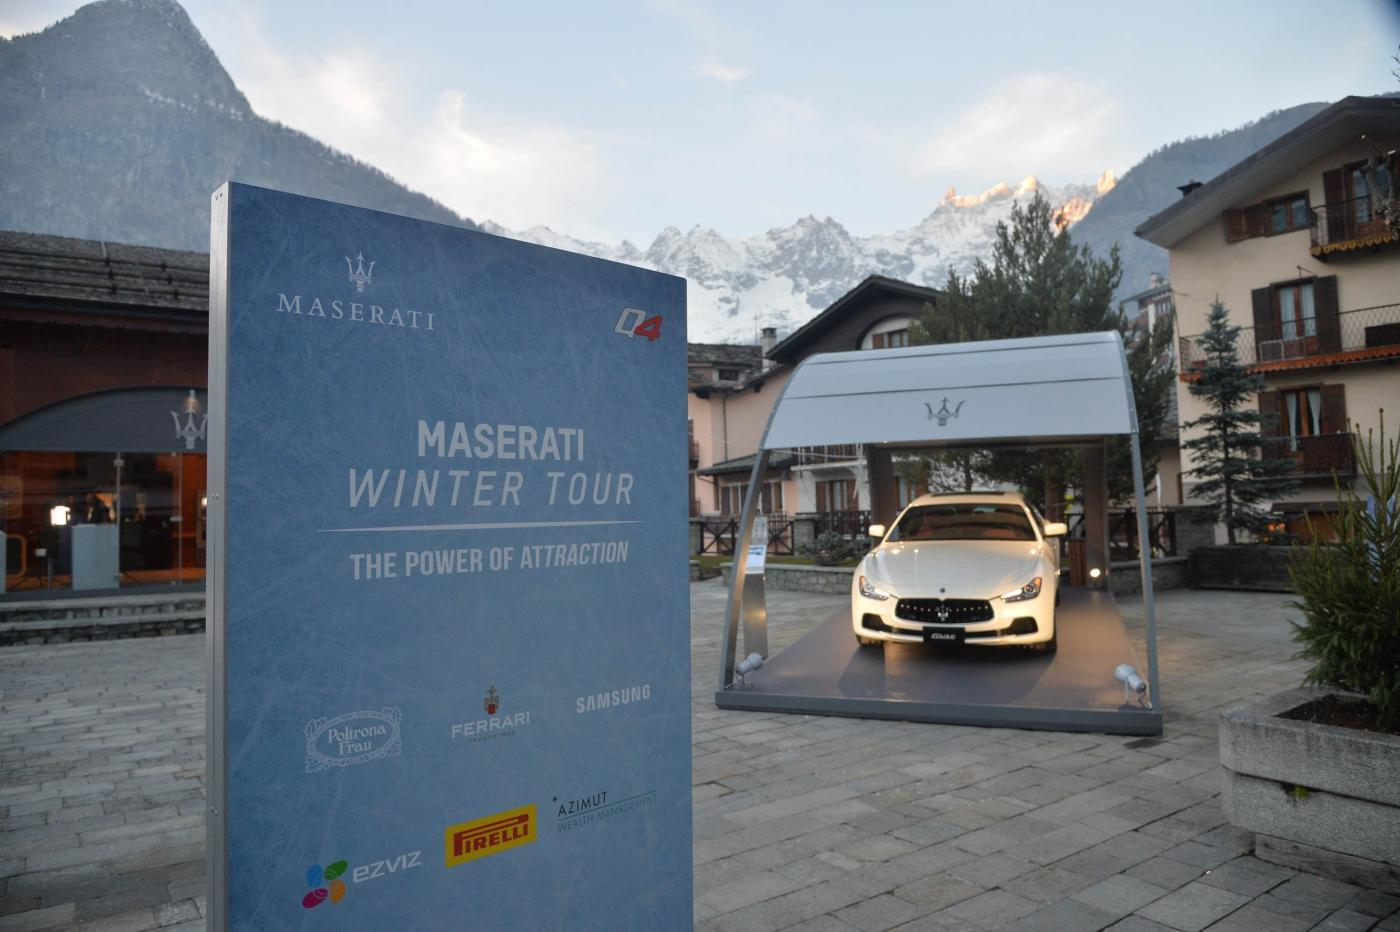 Maserati Winter Tour